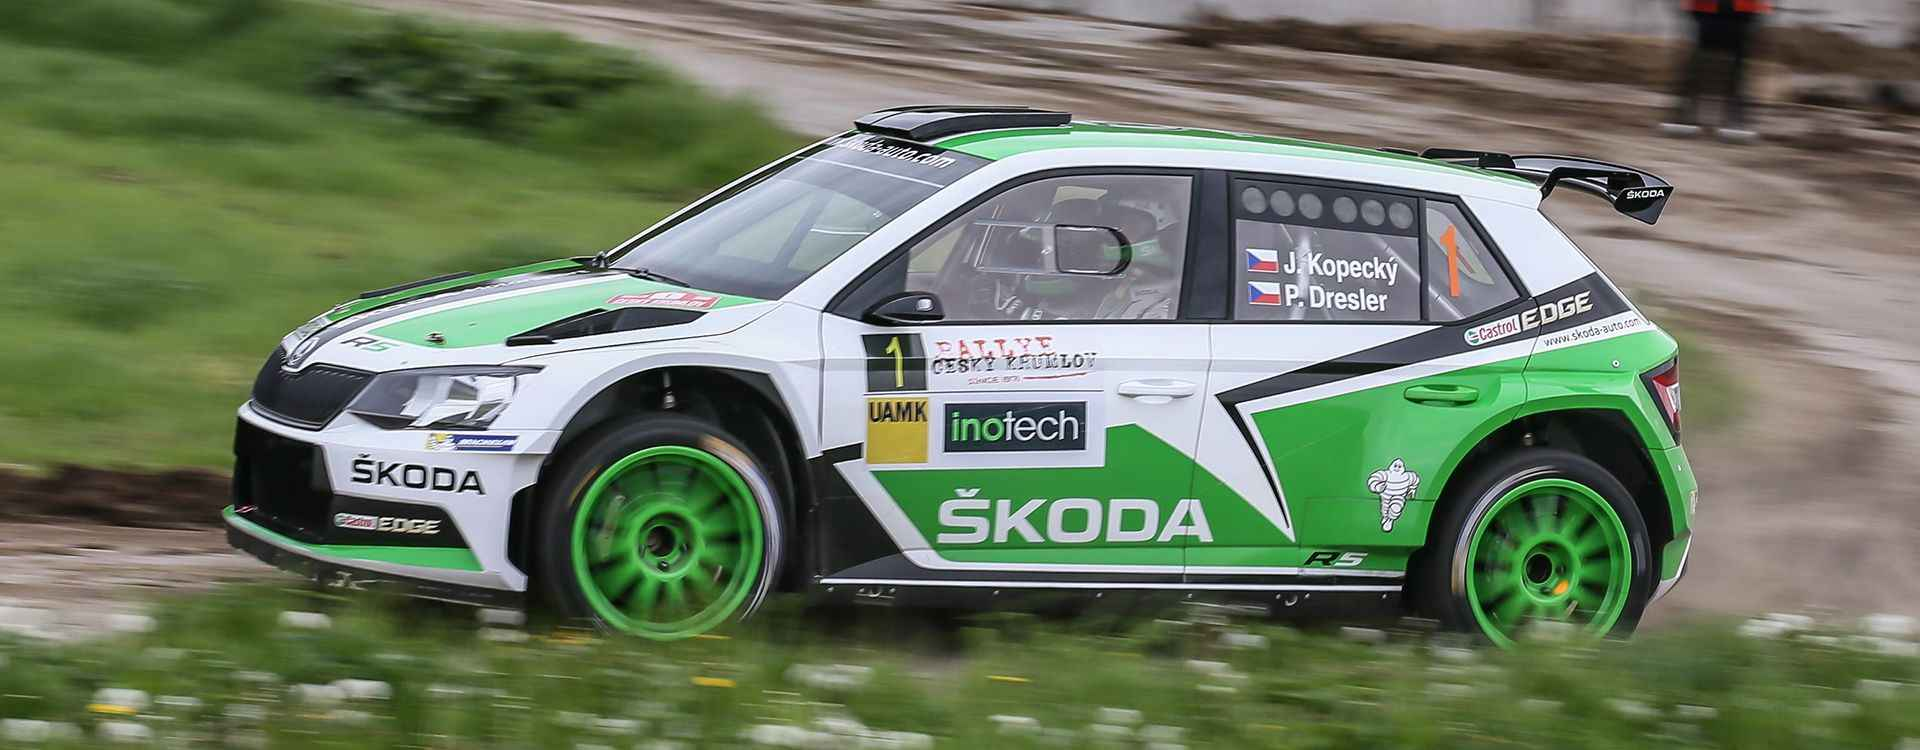 Rallye Krumlov 2015 – Souboj titánů pro Jana Kopeckého